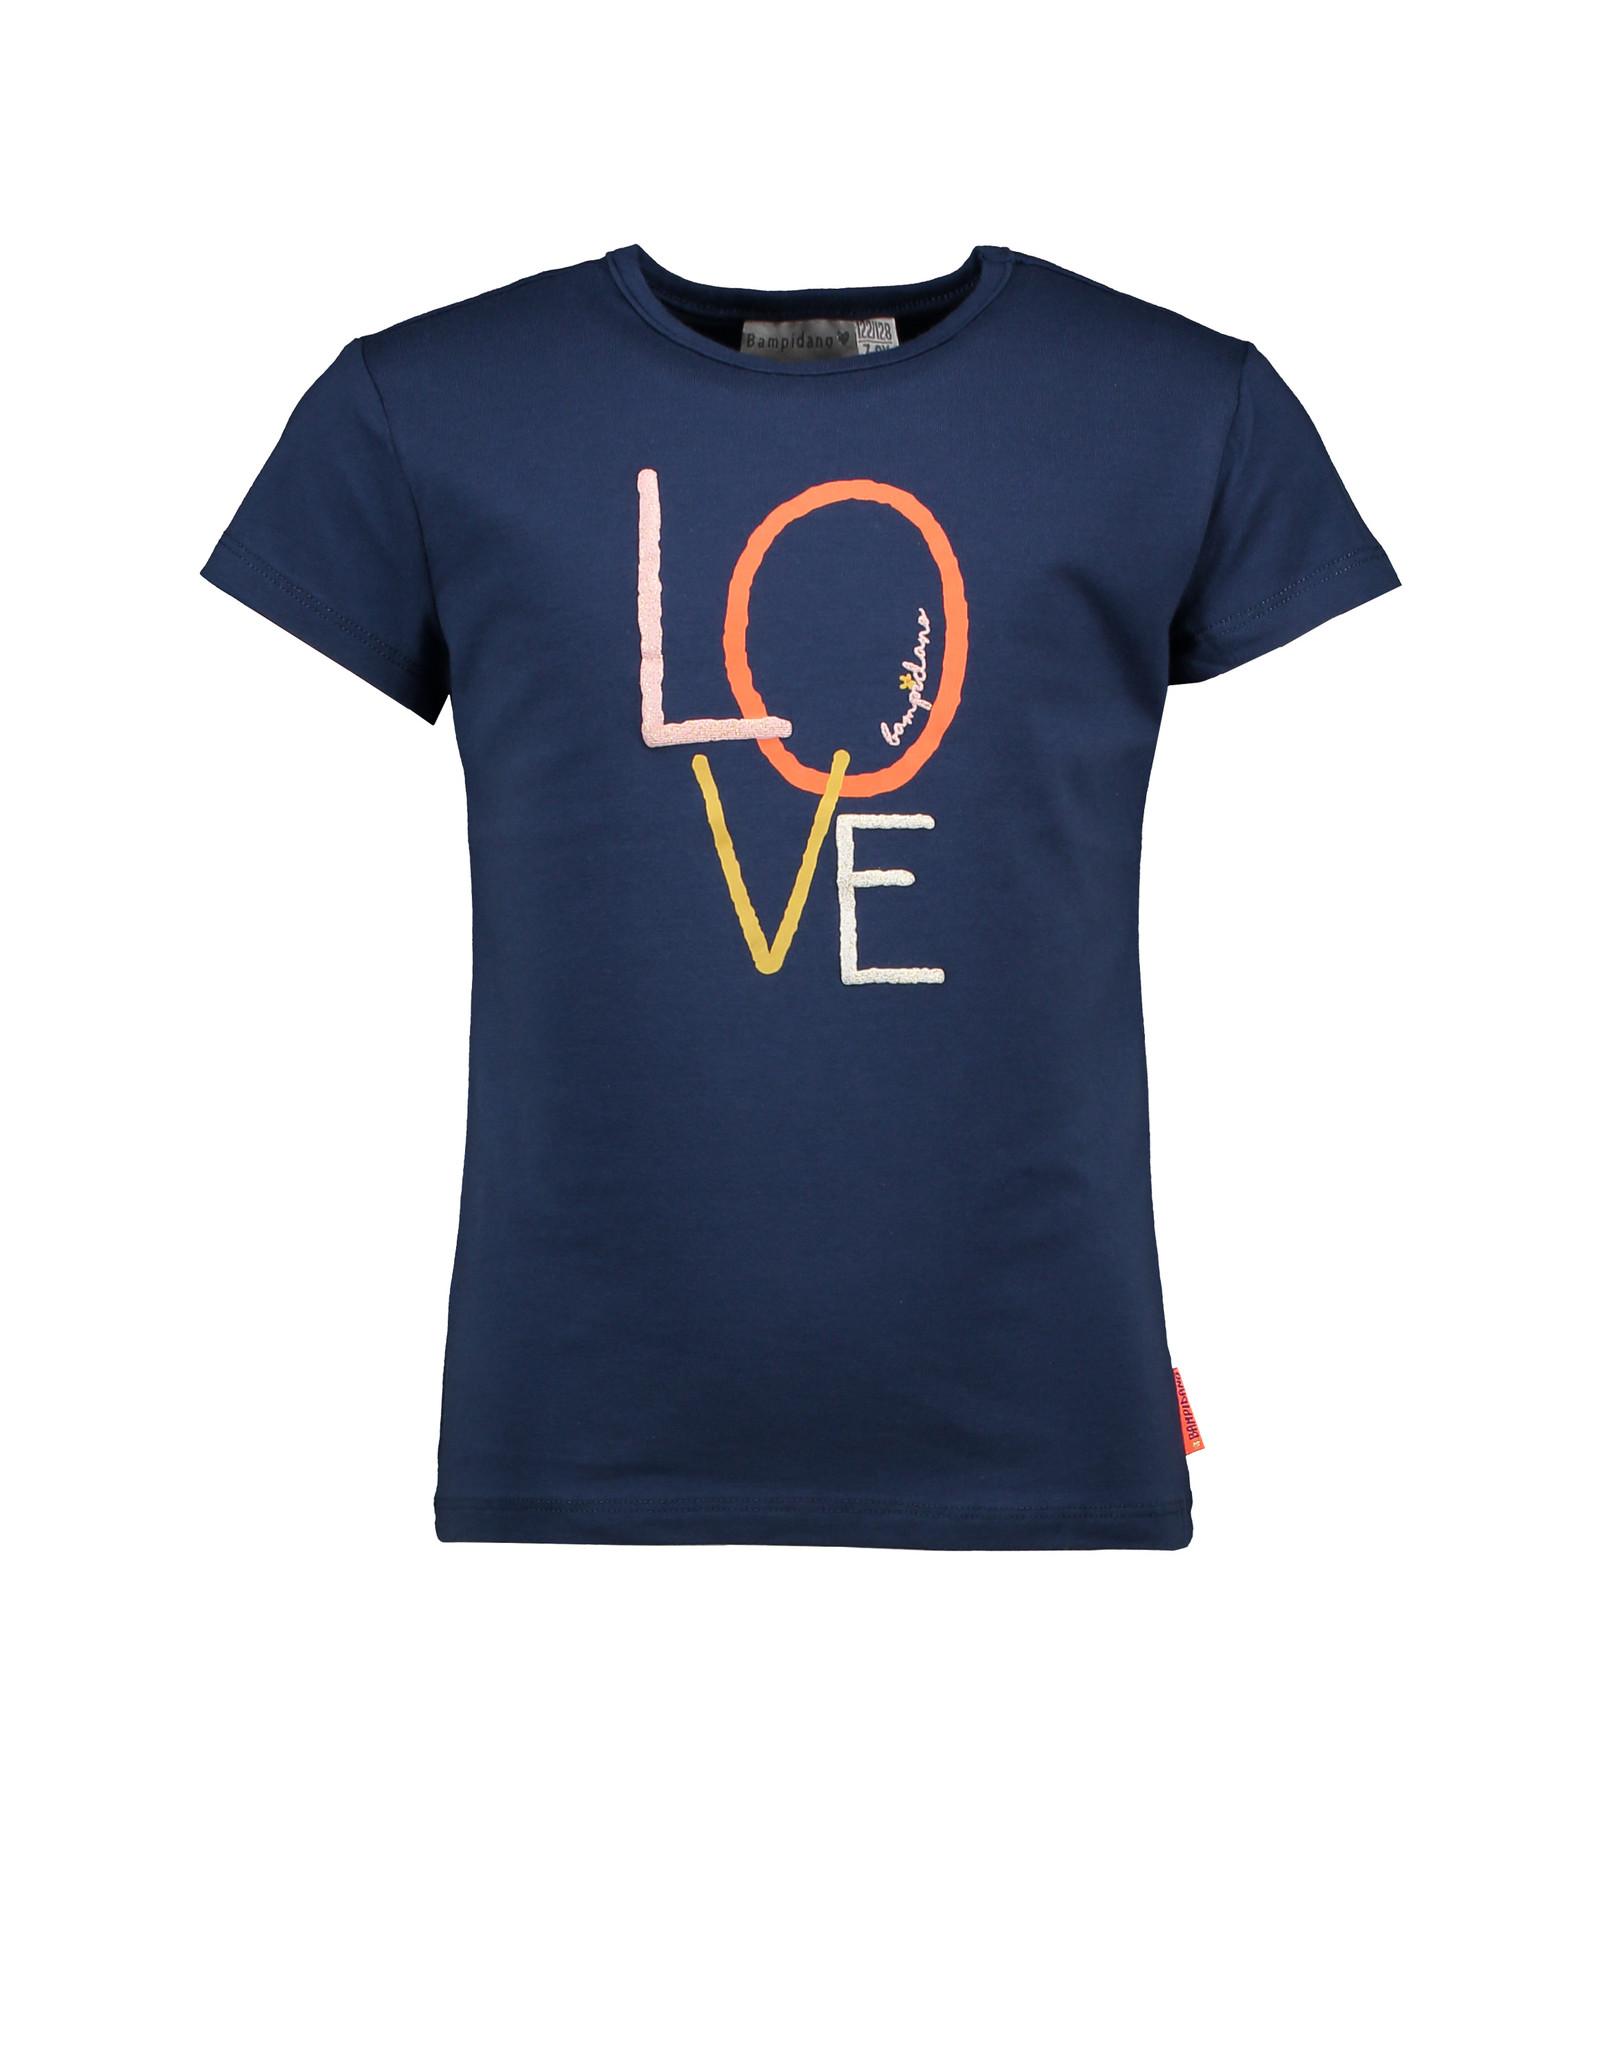 Bampidano Bampidano Junior Girls short sleeve T-shirt Dionne plain with print NATURE